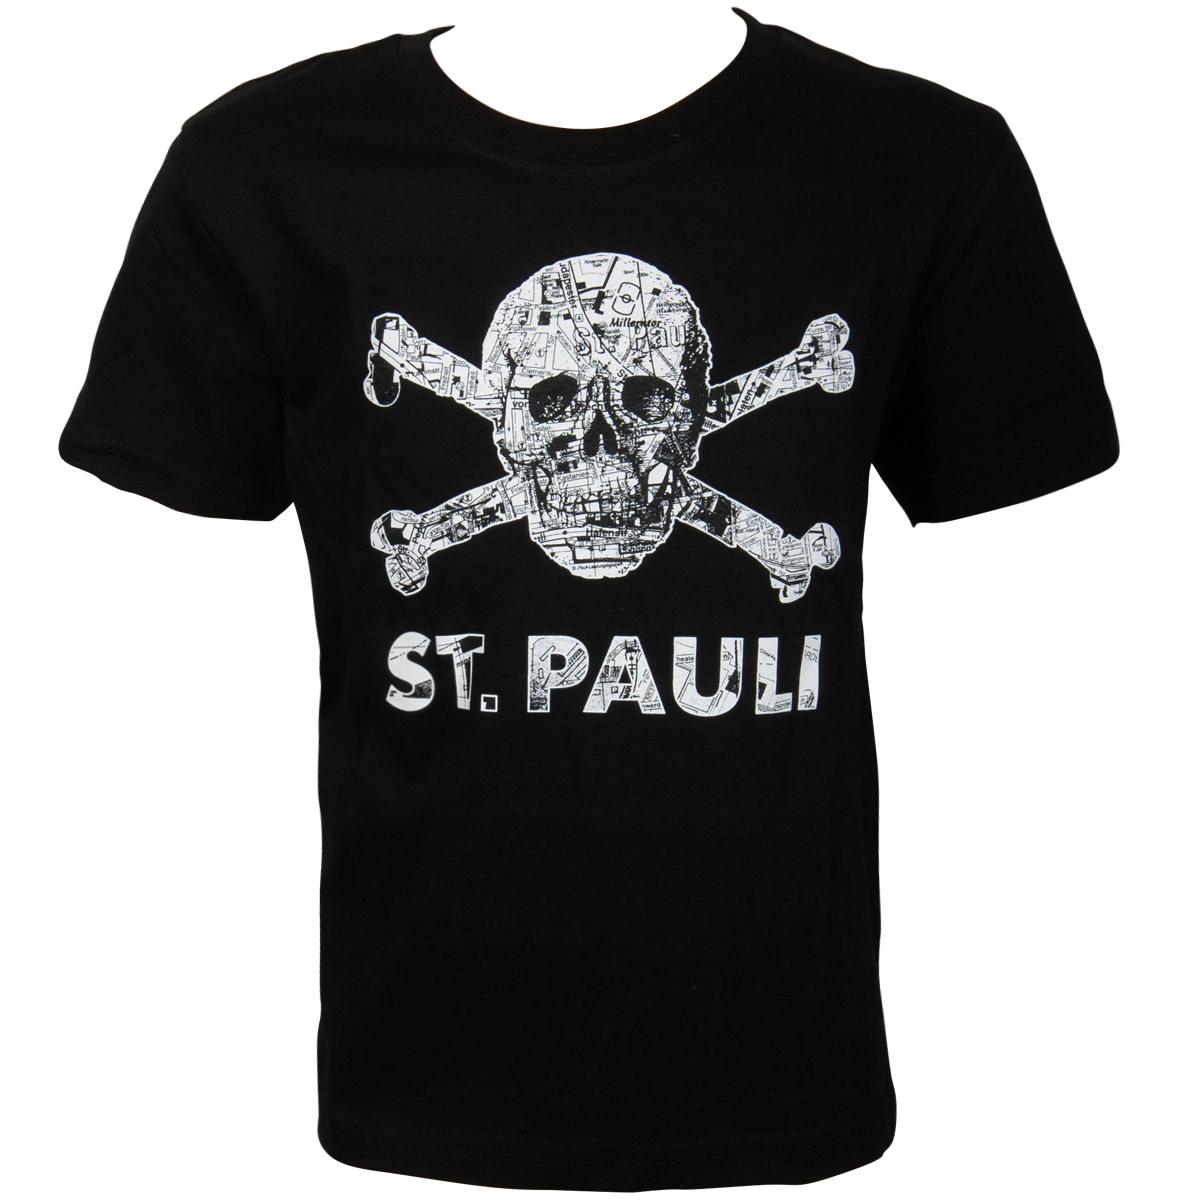 FC St. Pauli - Kinder T-Shirt Totenkopf Stadtplan Schwarz-Weiss - schwarz